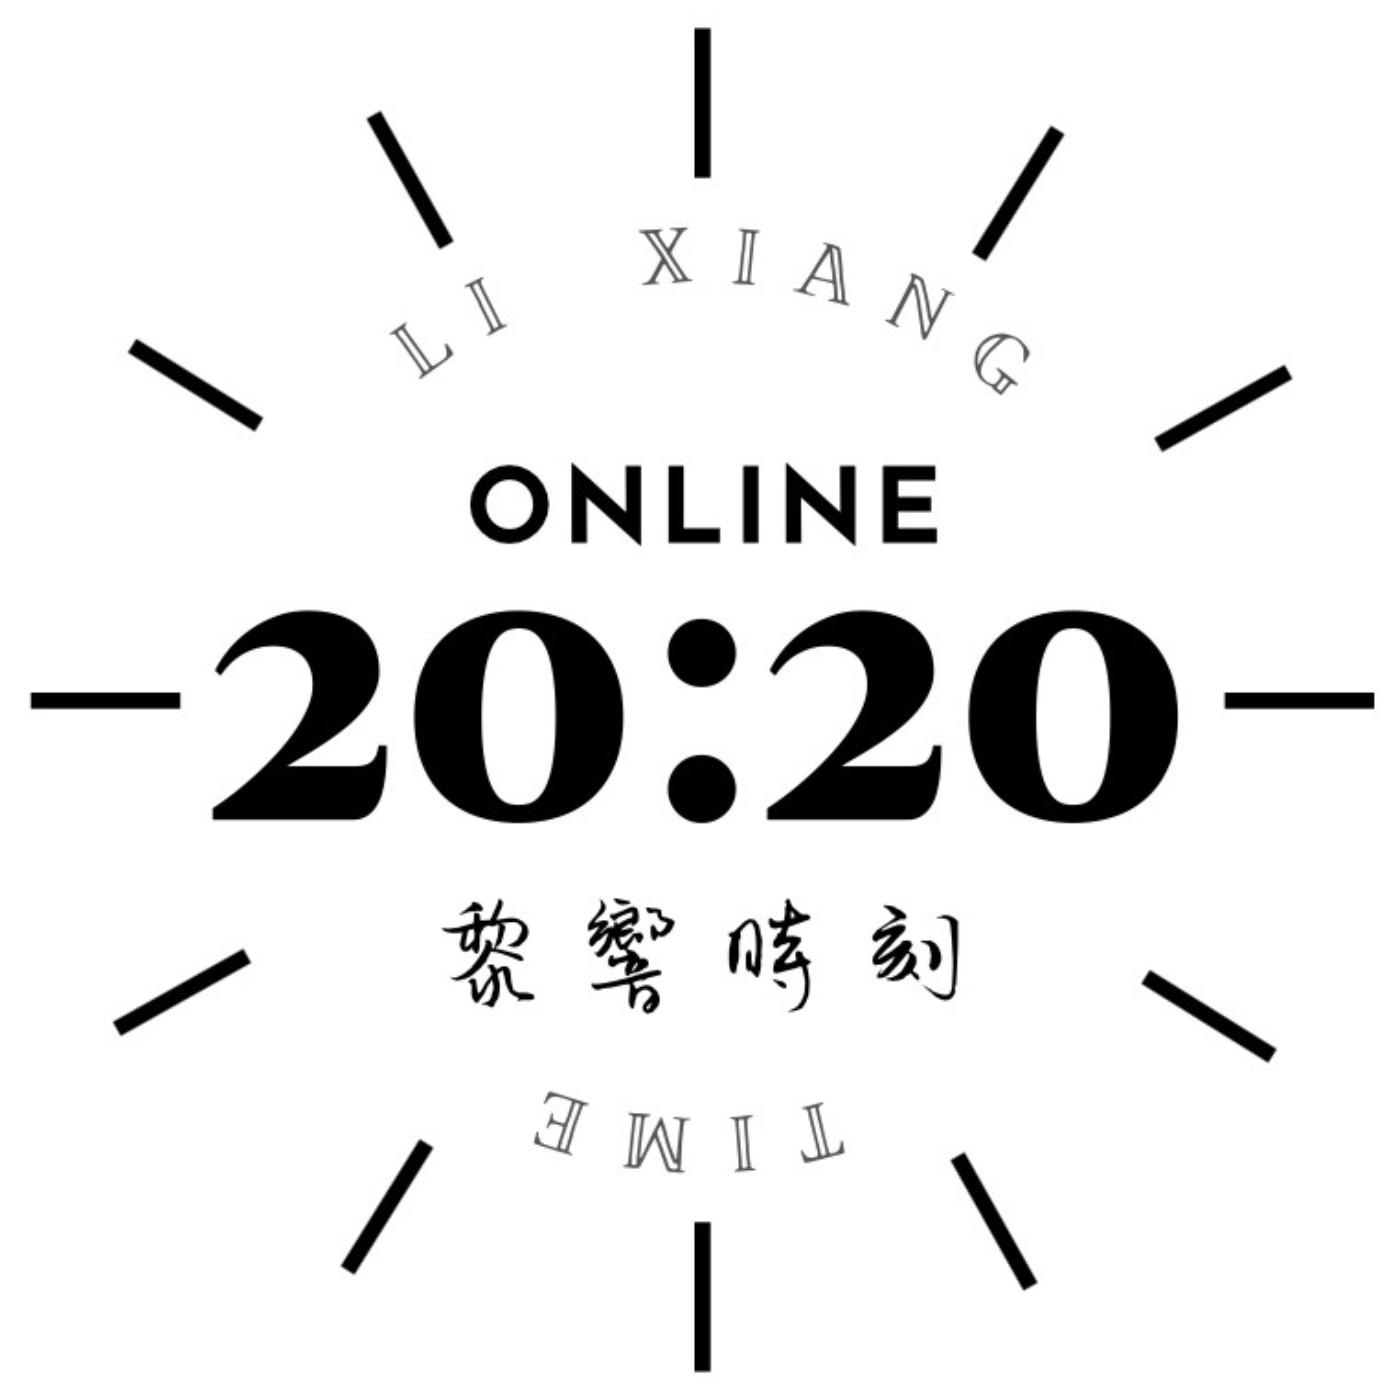 EP10. 有一種很挺動物的行為,你知道?ft. 康康&Joe【挺挺動物】